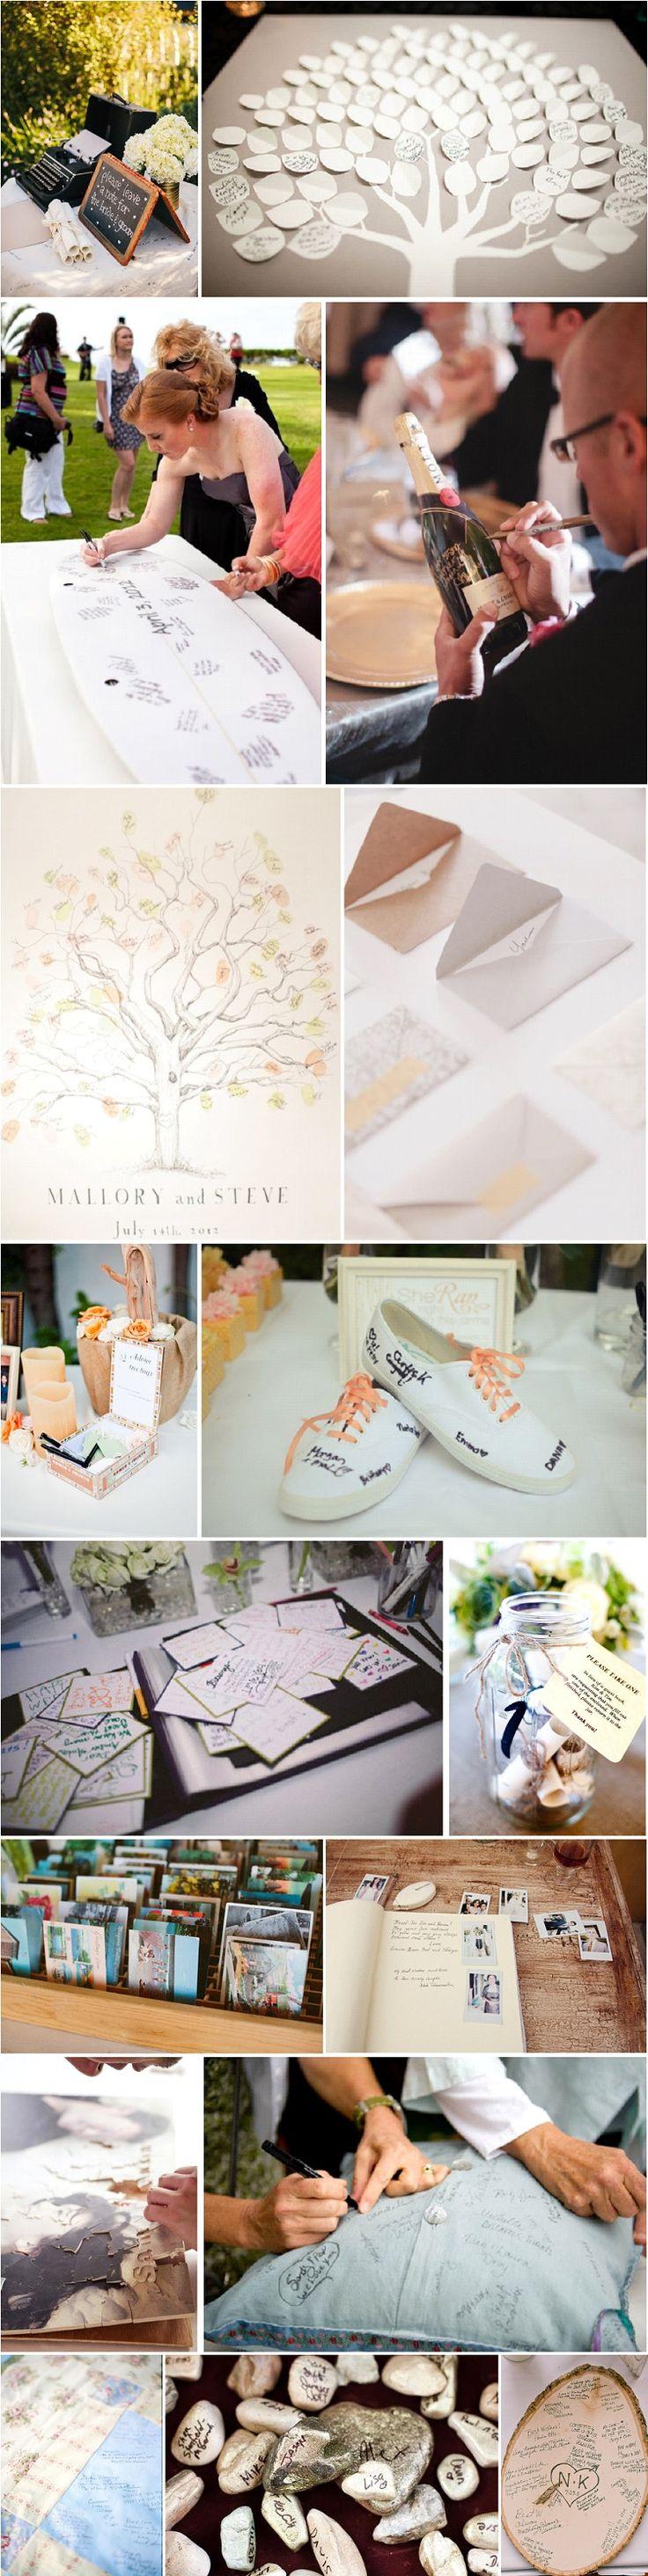 plan-de-table-mariage1.jpg 750×2984 pixels